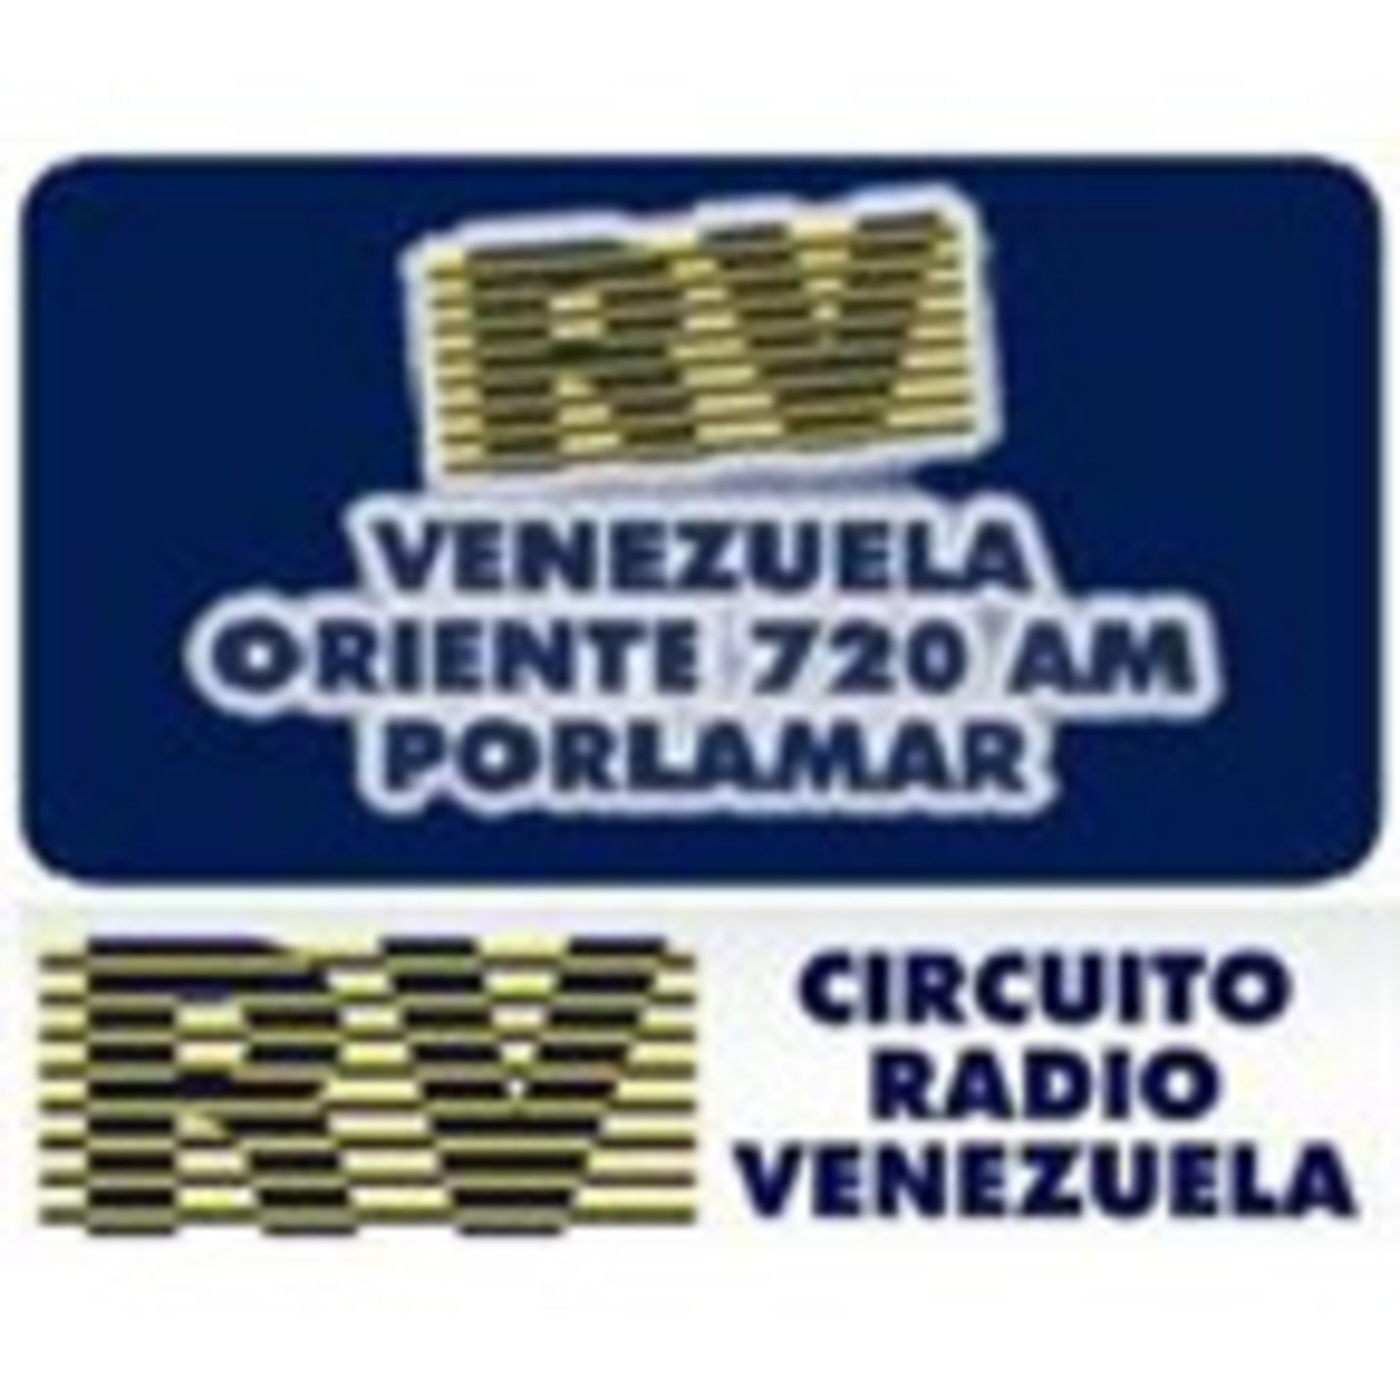 Radio Venezuela Oriente 720am